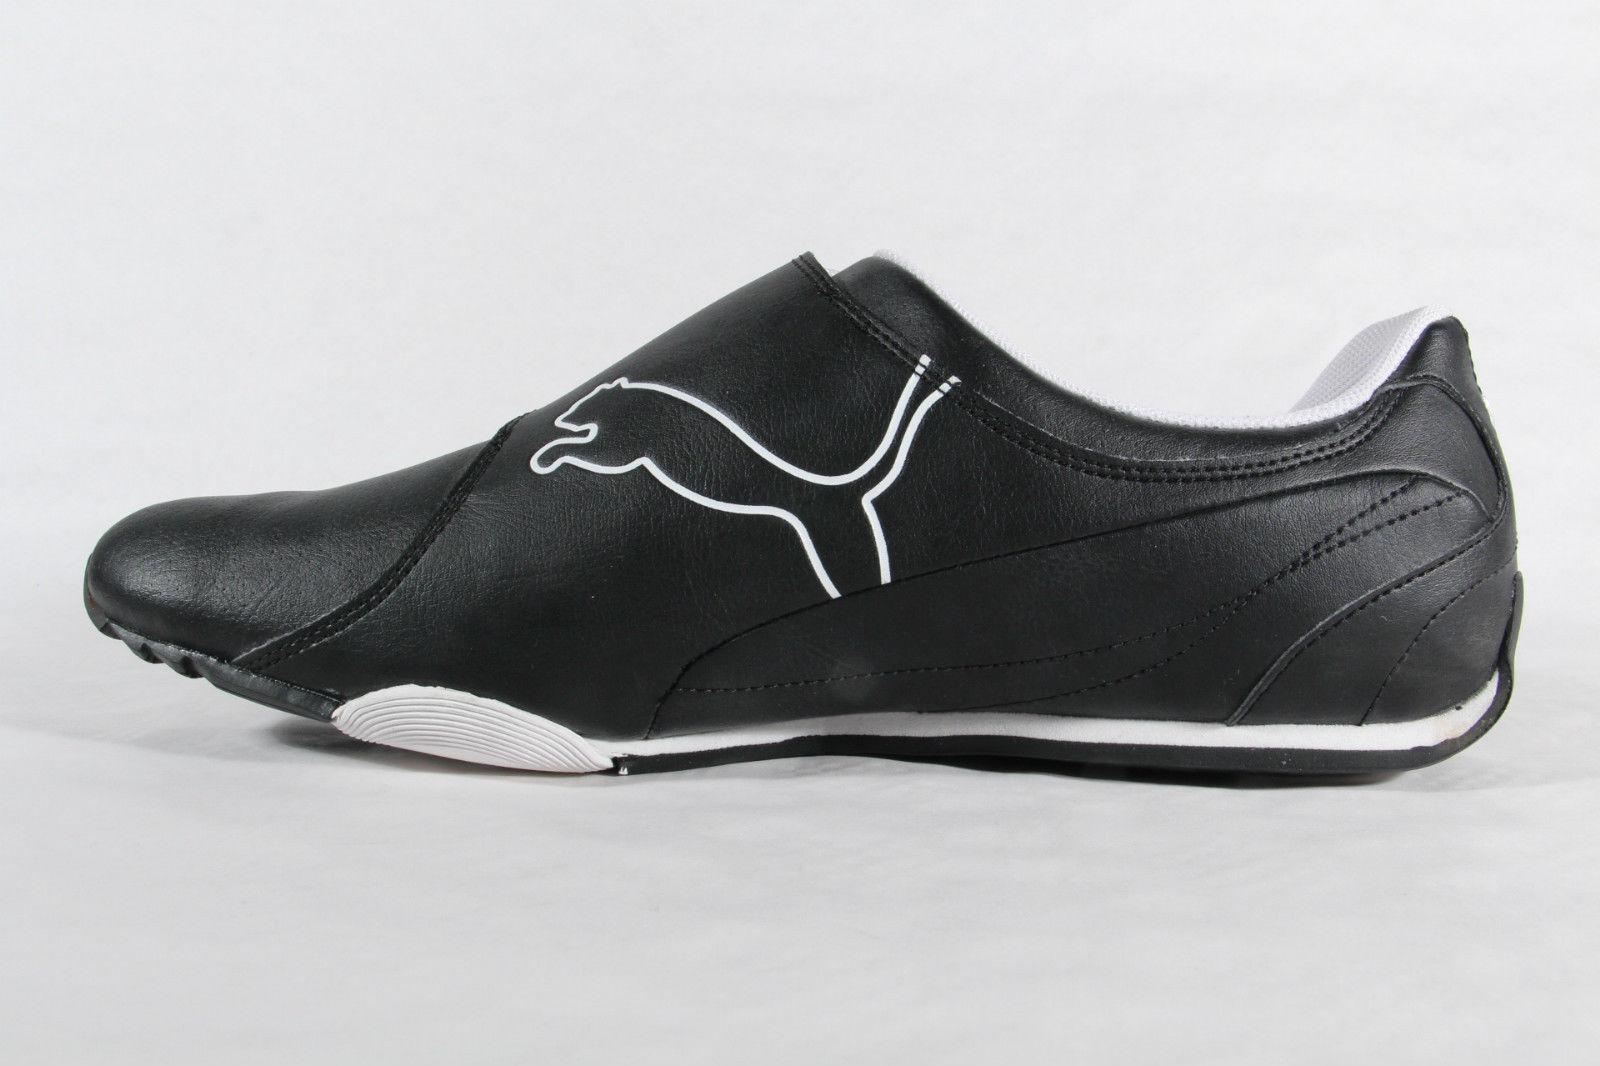 puma sneaker herren klettverschluss inkline. Black Bedroom Furniture Sets. Home Design Ideas